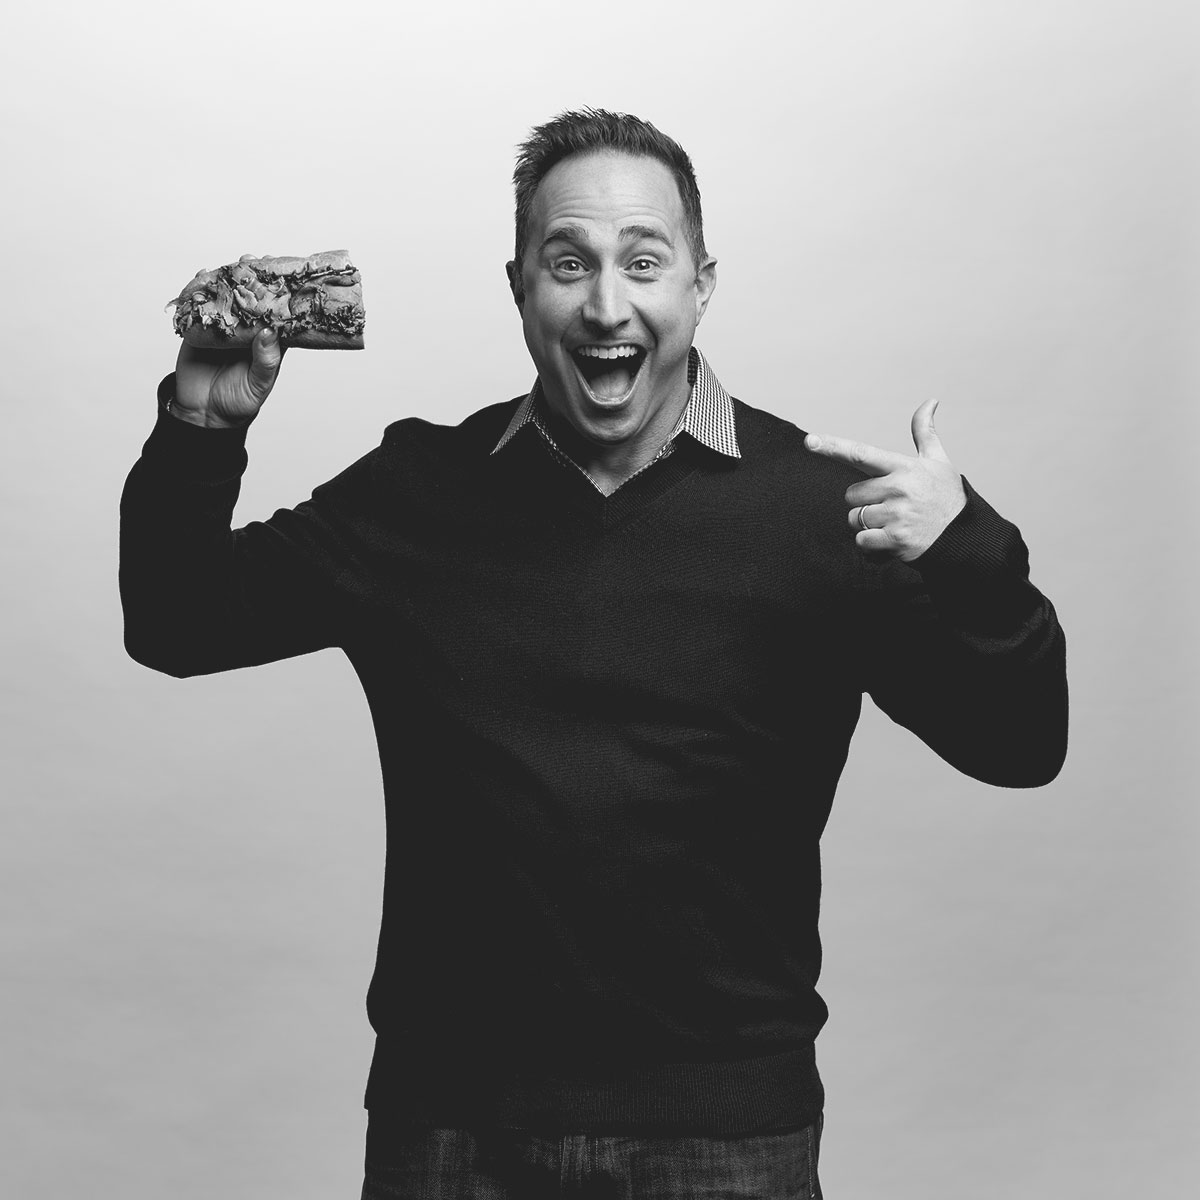 Matt Diefenbach loves Roast Beef sandwiches